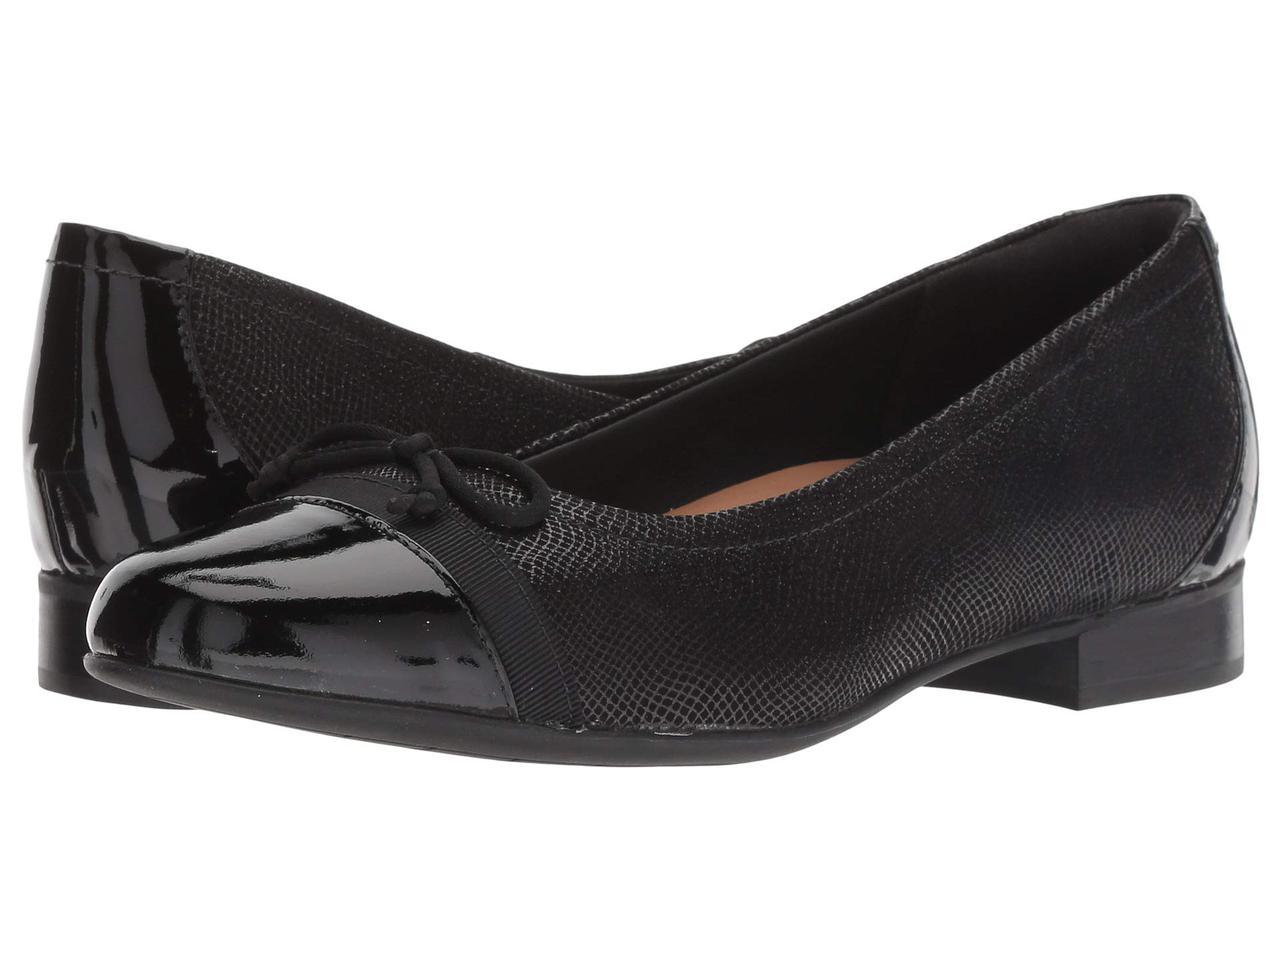 Туфли без каблука (Оригинал) Clarks Un Blush Cap Black Nubuck/Patent Leather Combination